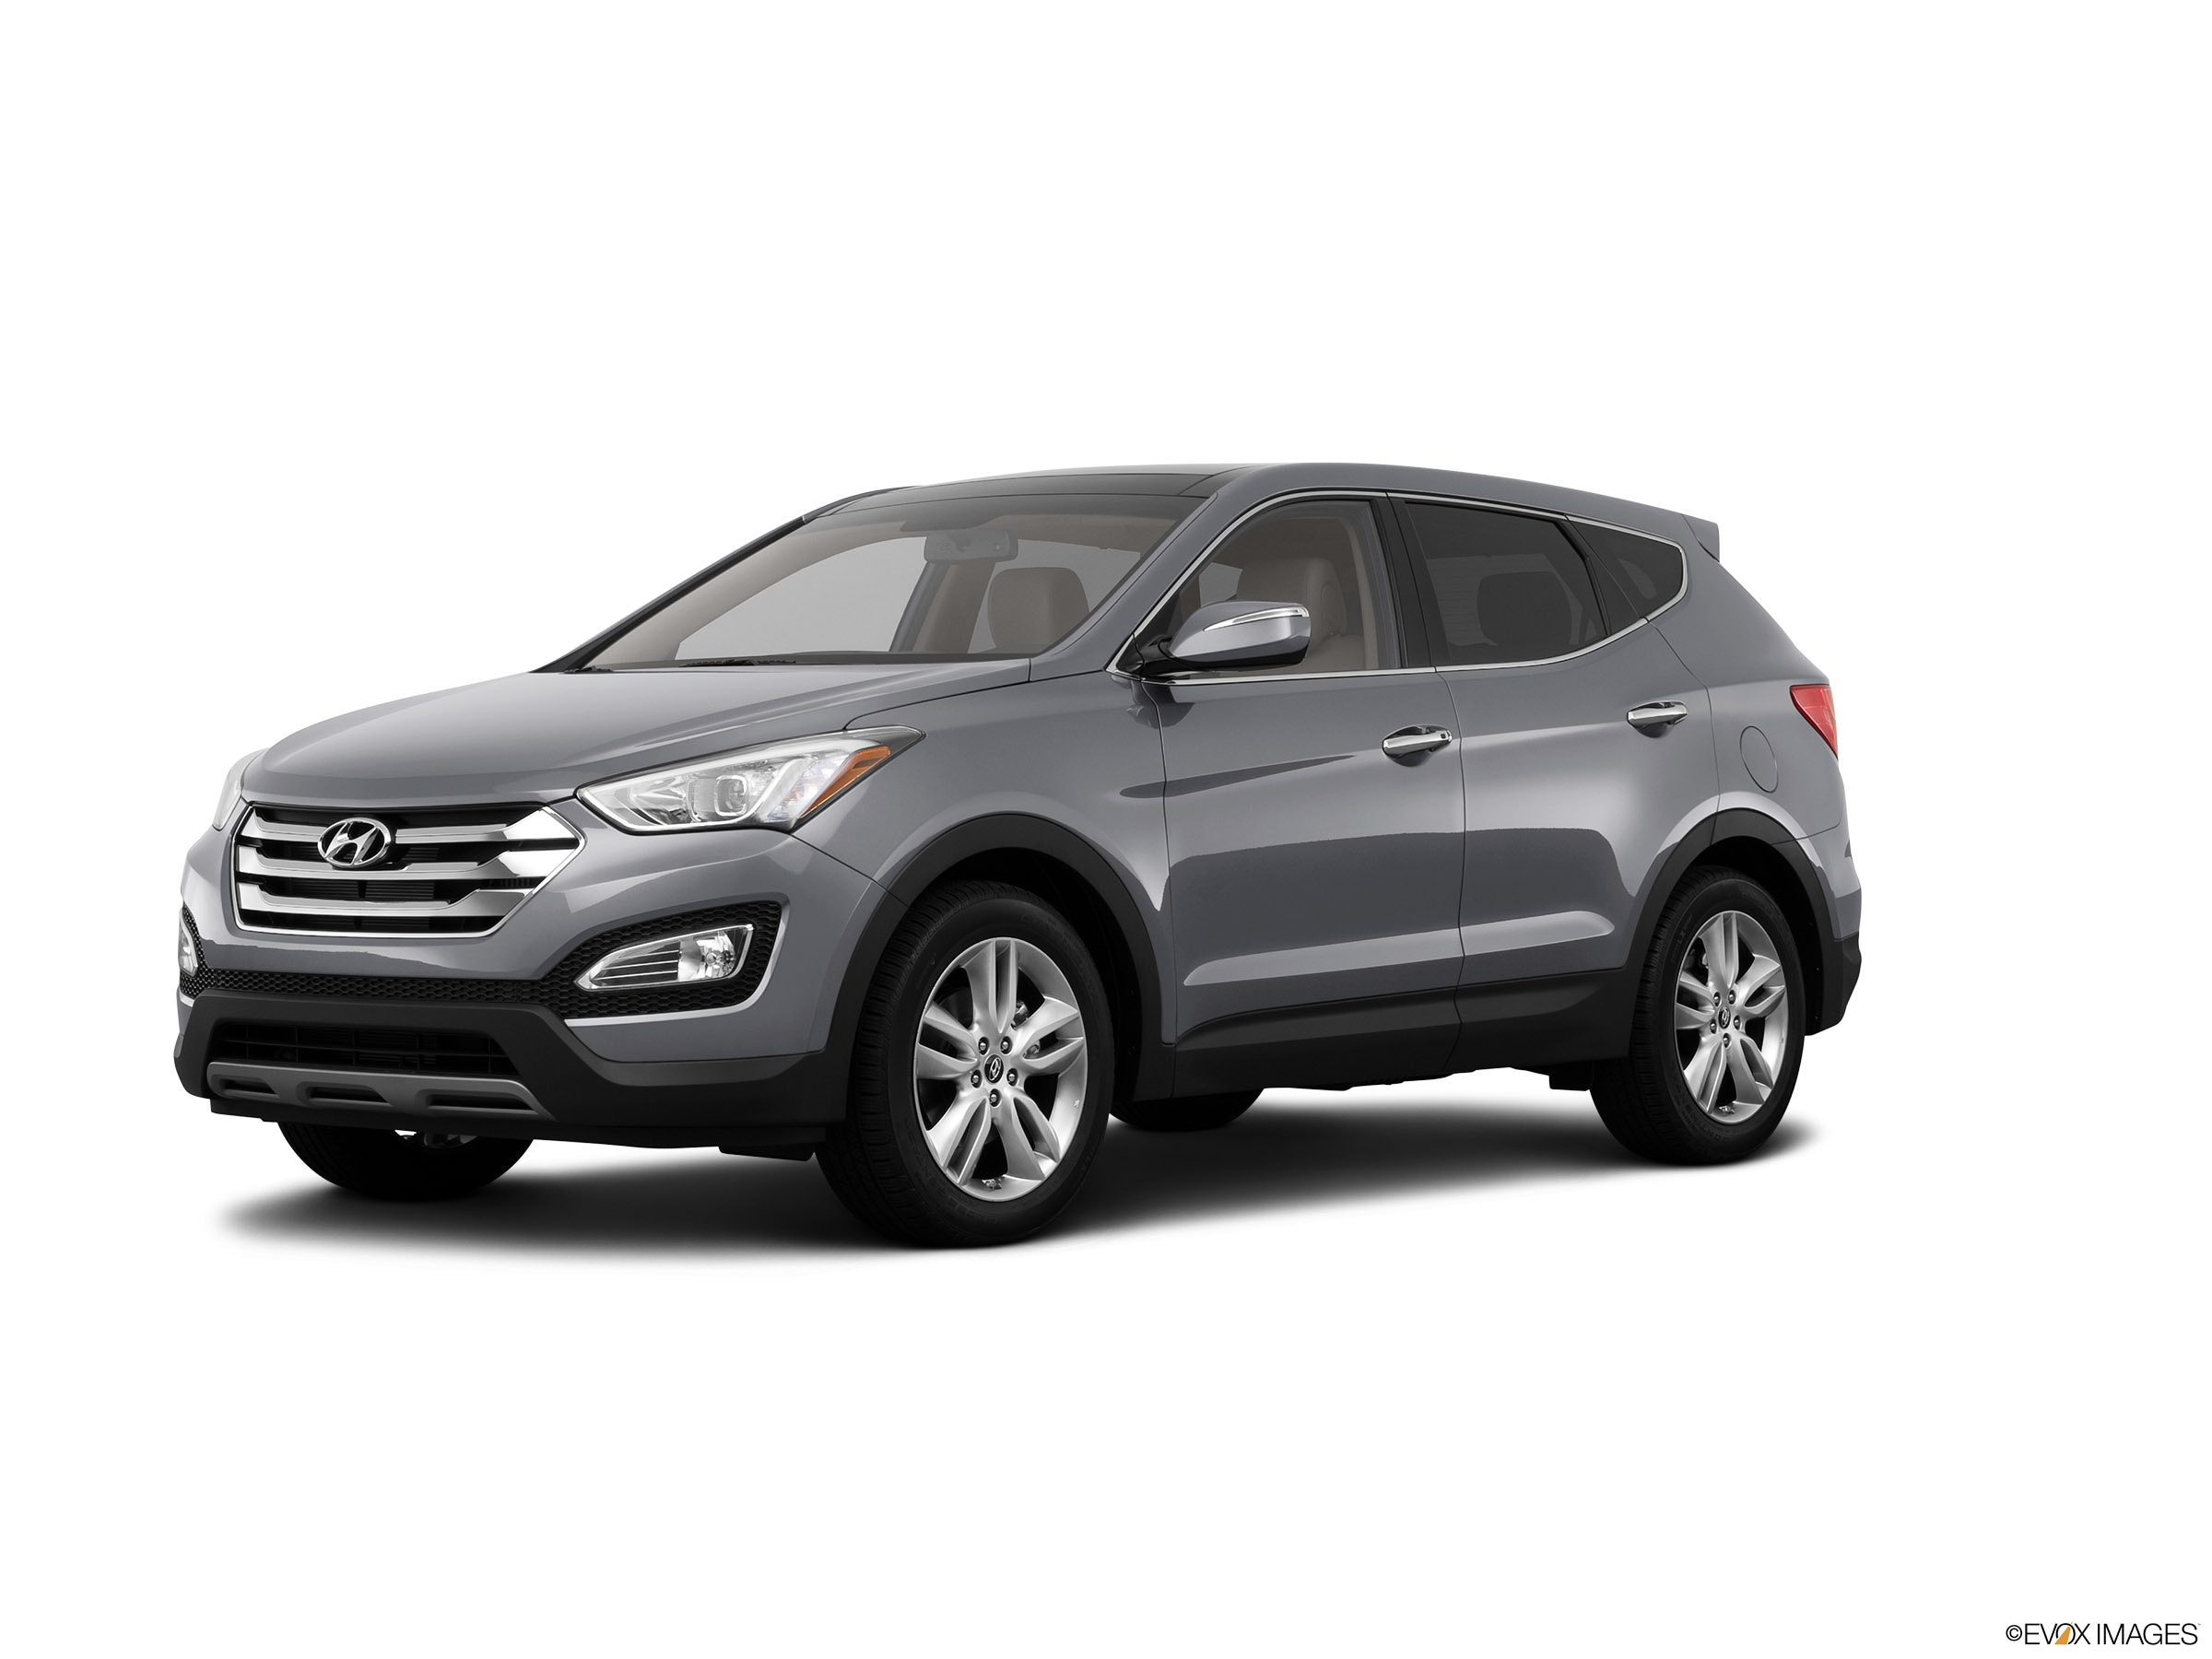 Used 2013 Hyundai Santa Fe Sport 2.0T with VIN 5XYZUDLA2DG072339 for sale in Maplewood, Minnesota